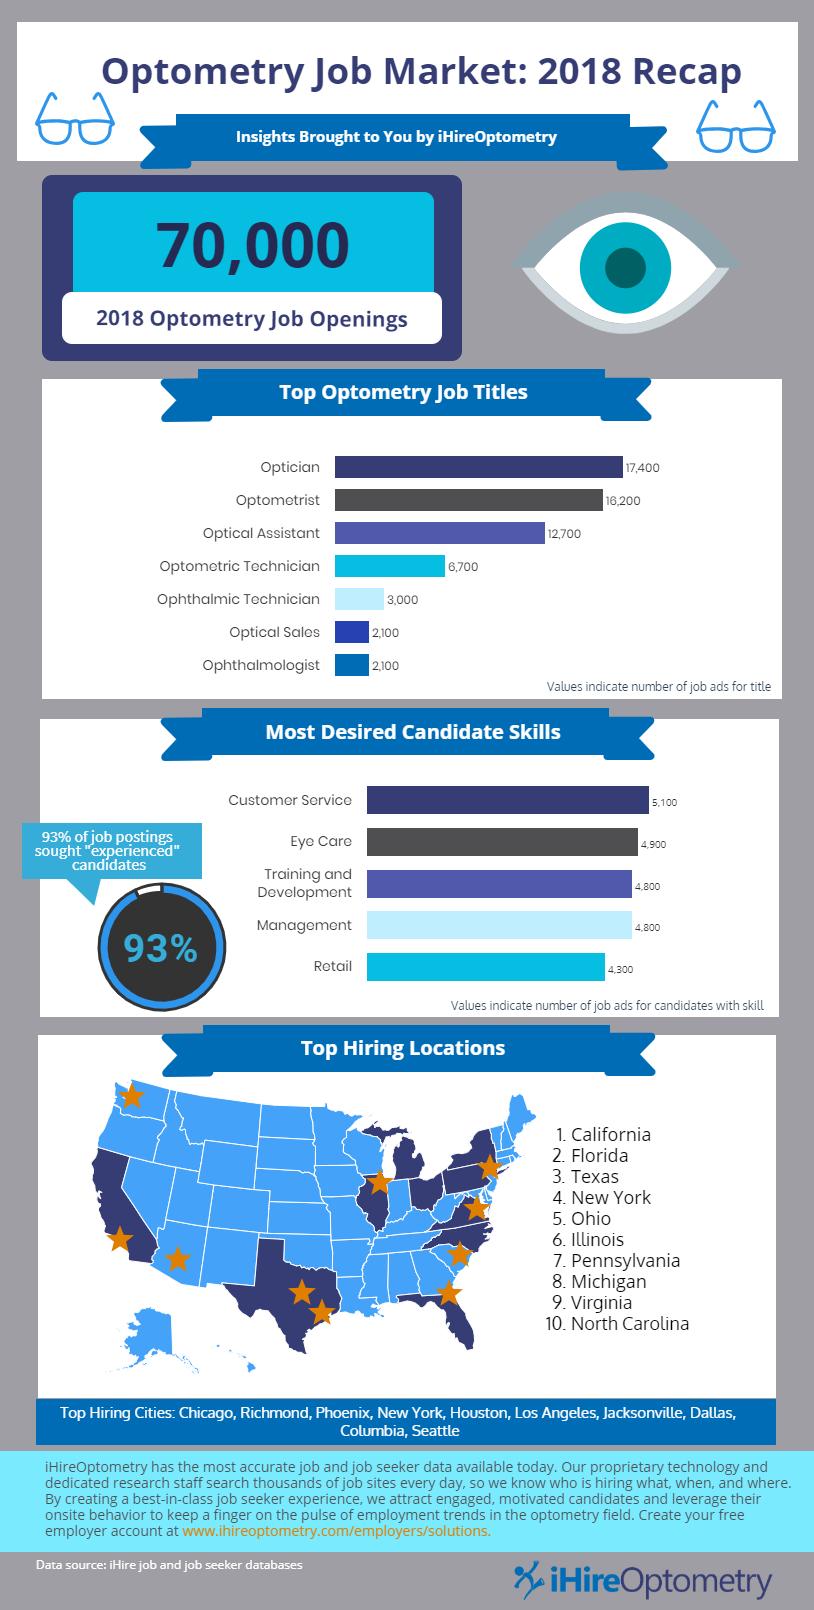 Infographic depicting 2018 optometry job market